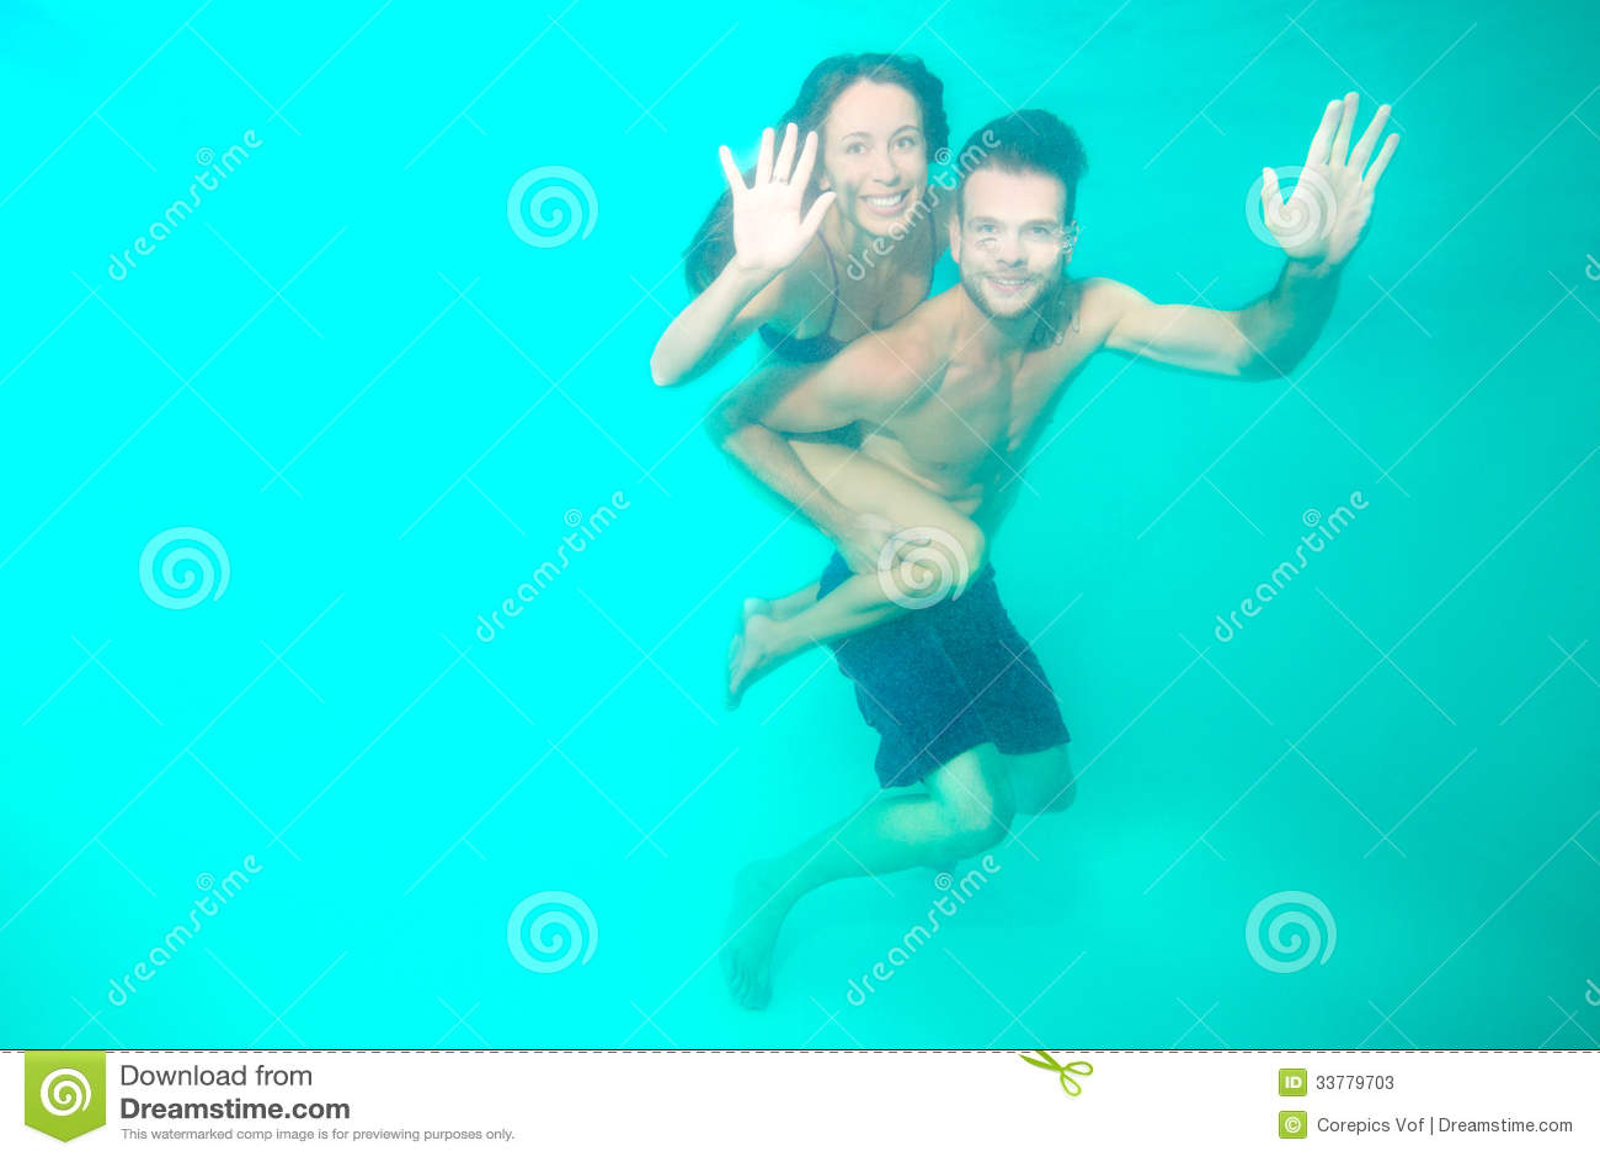 Couple diving underwater